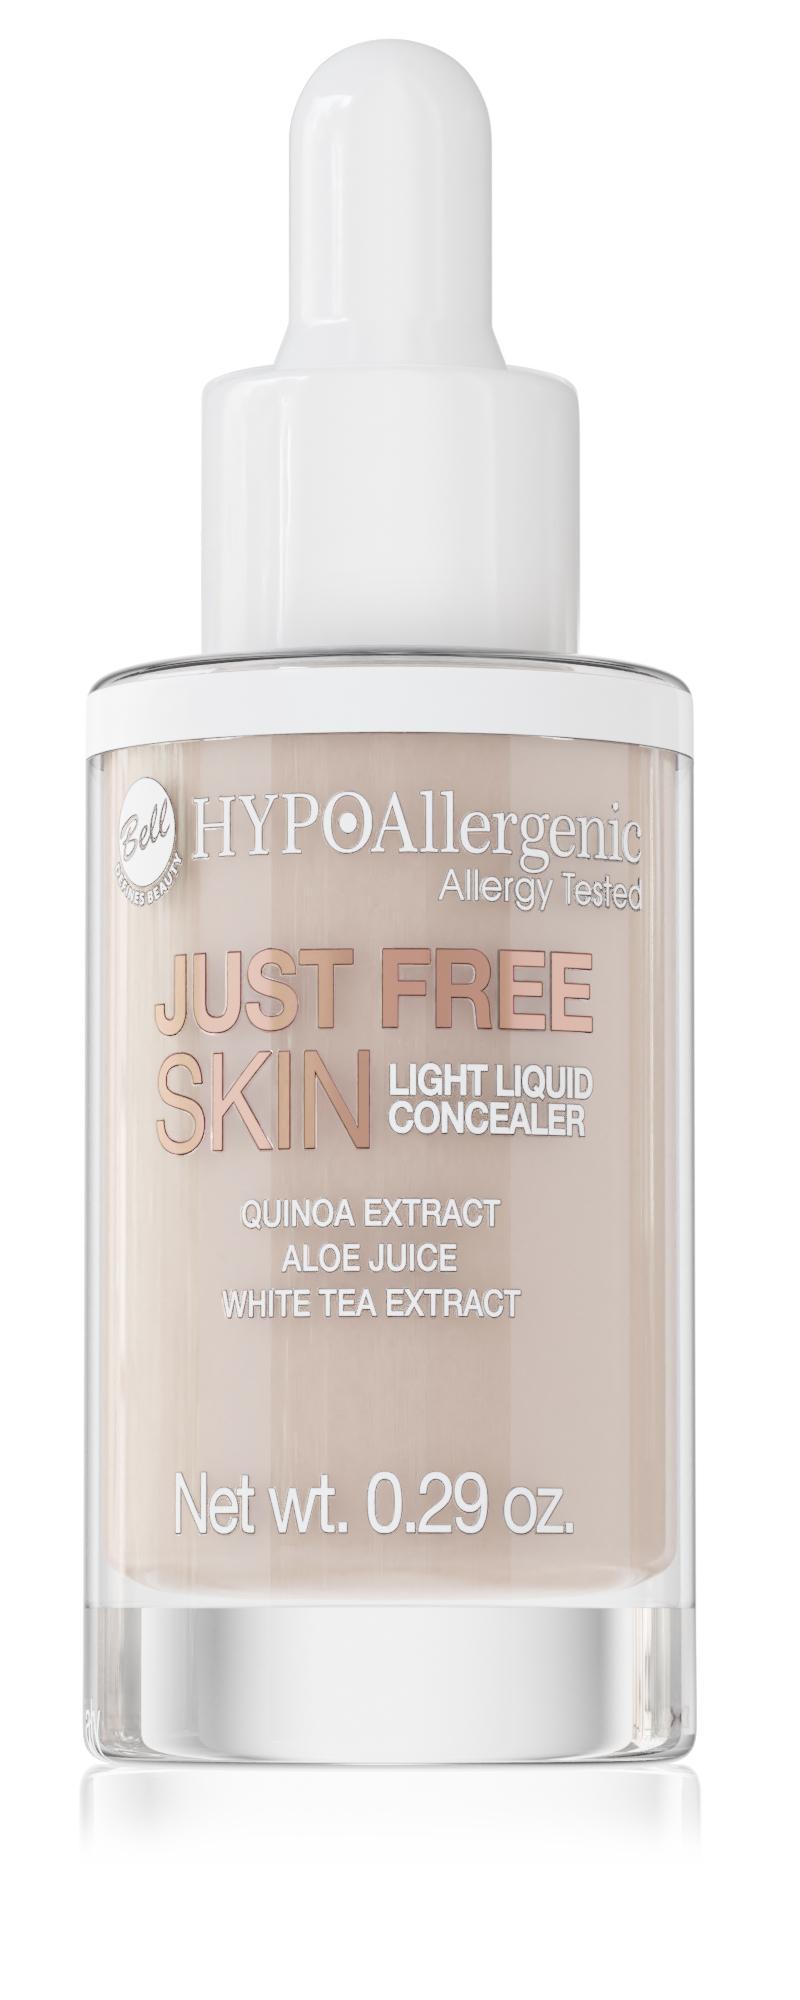 HYPOAllergenic Just Free Skin Light Liquid Concealer